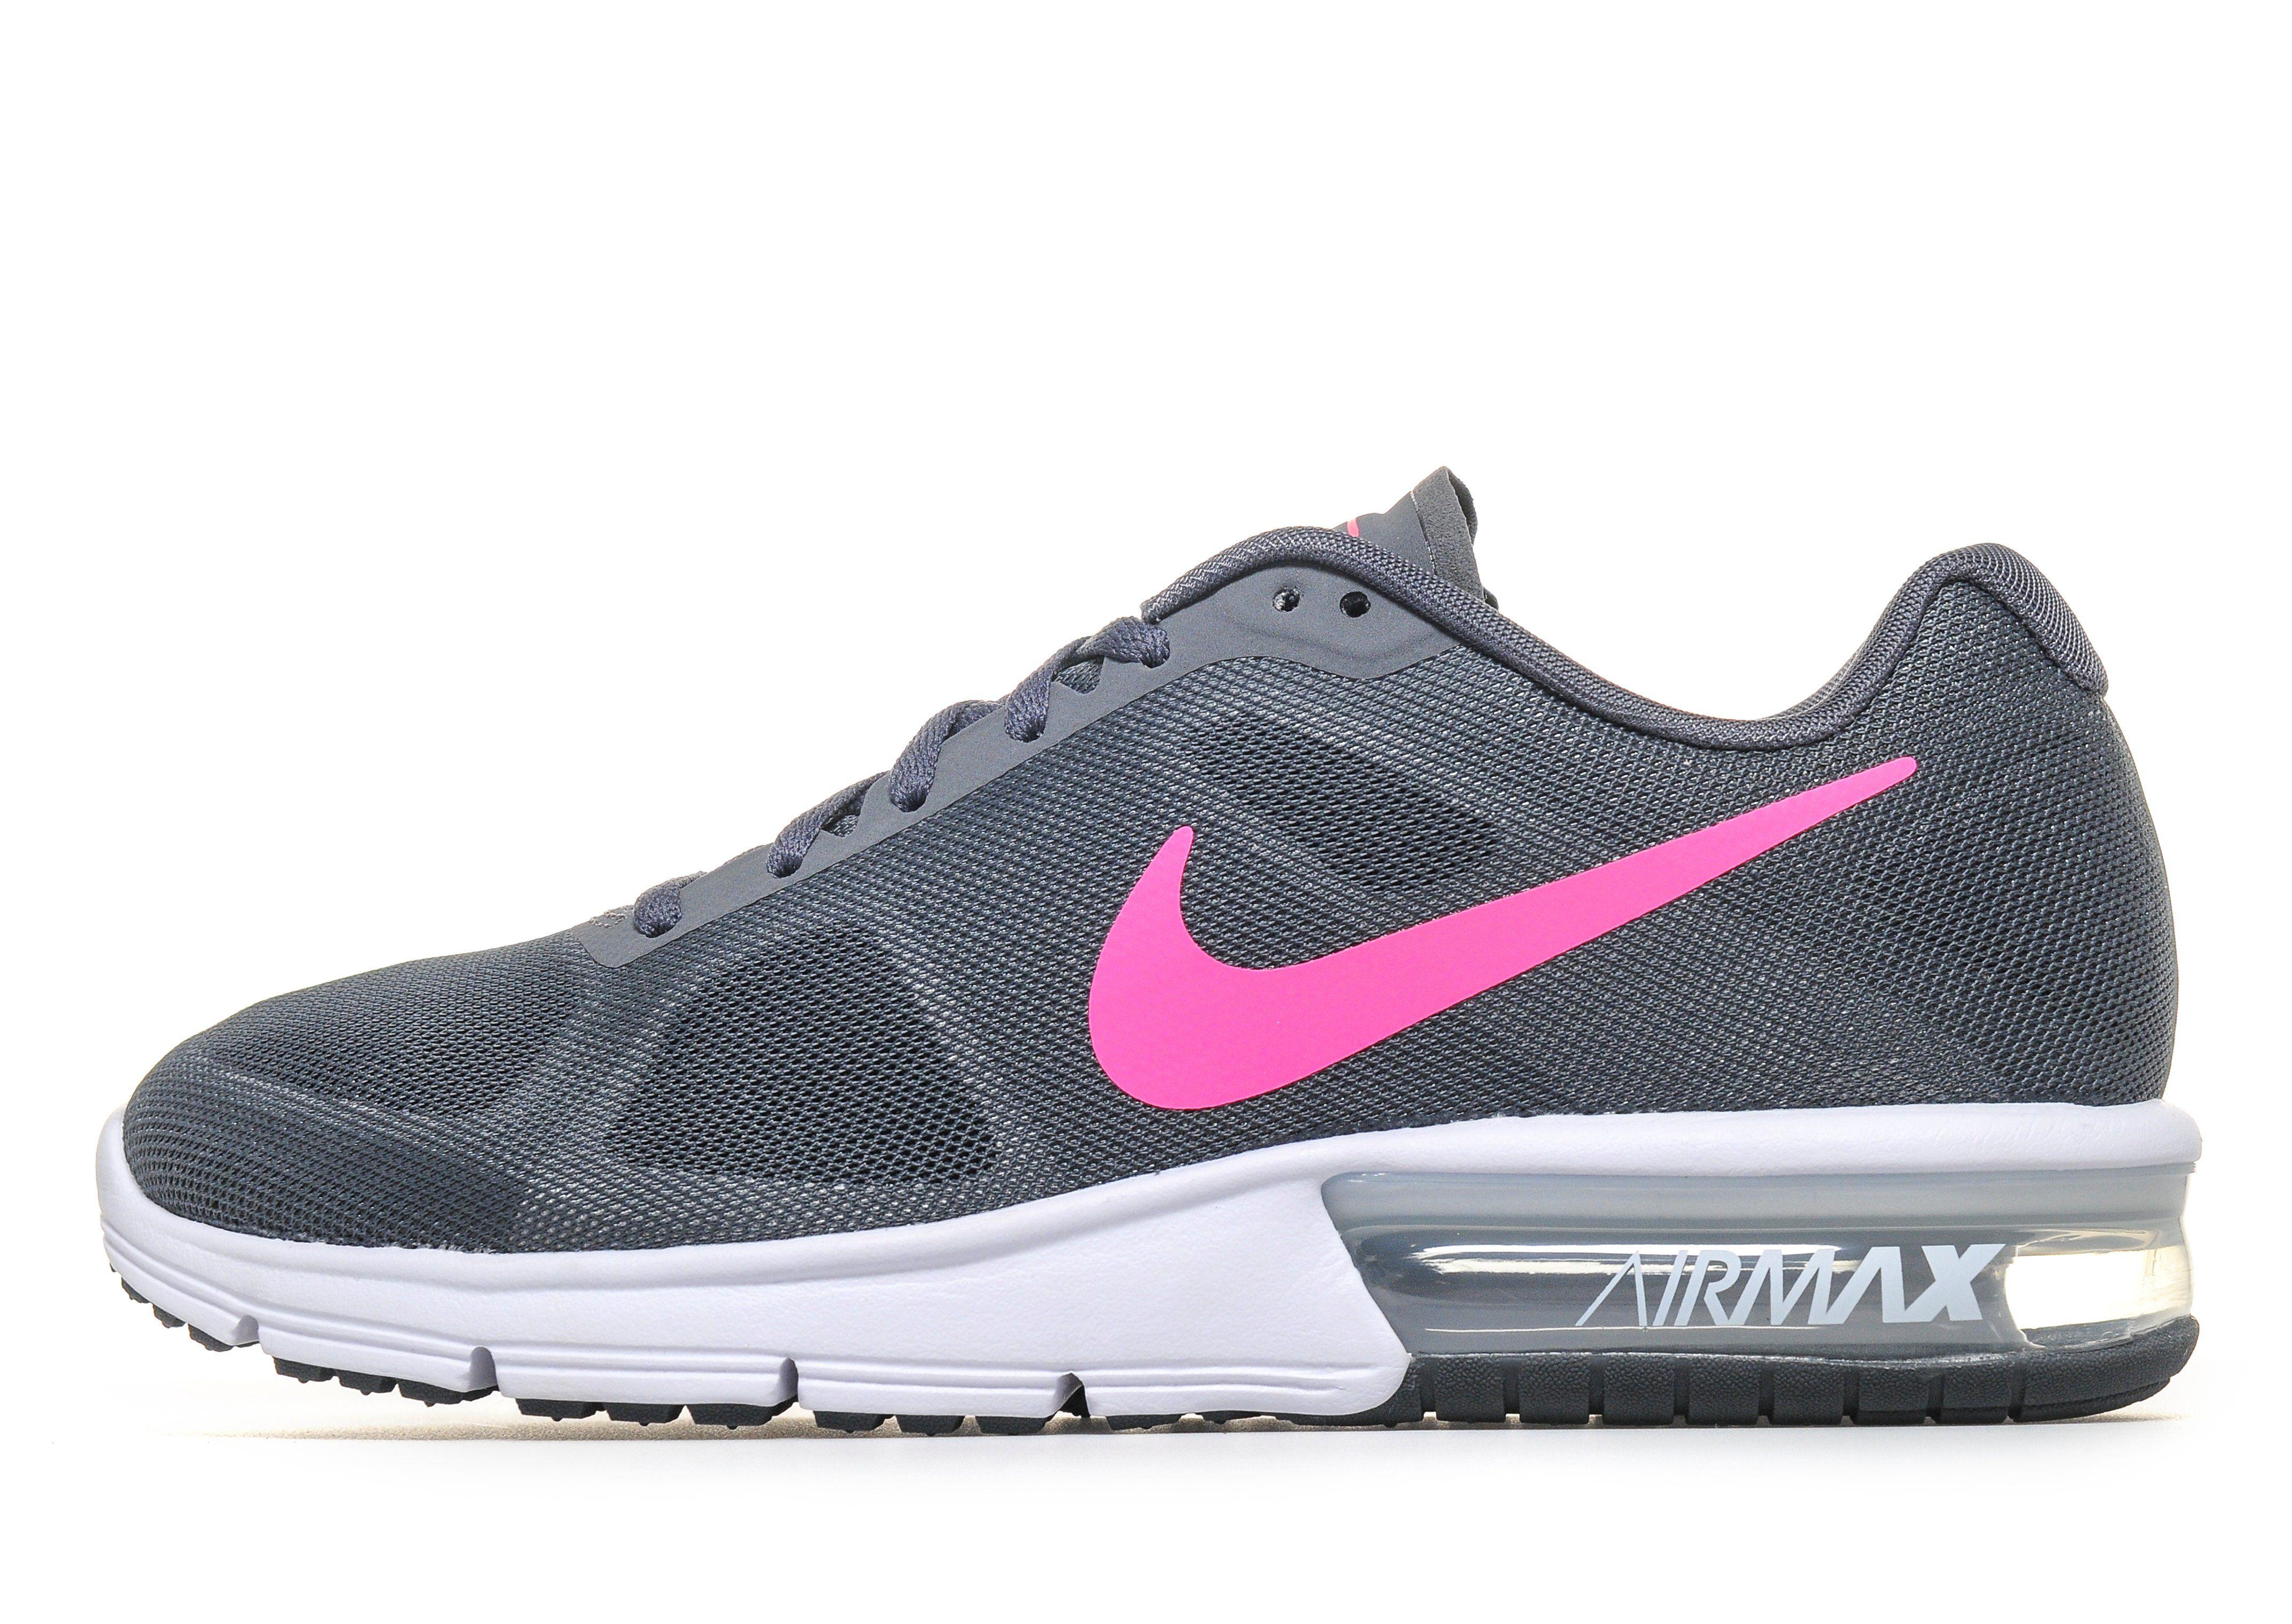 5e4602ef26 new Nike Air Max Sequent Women's   JD Sports - ramseyequipment.com